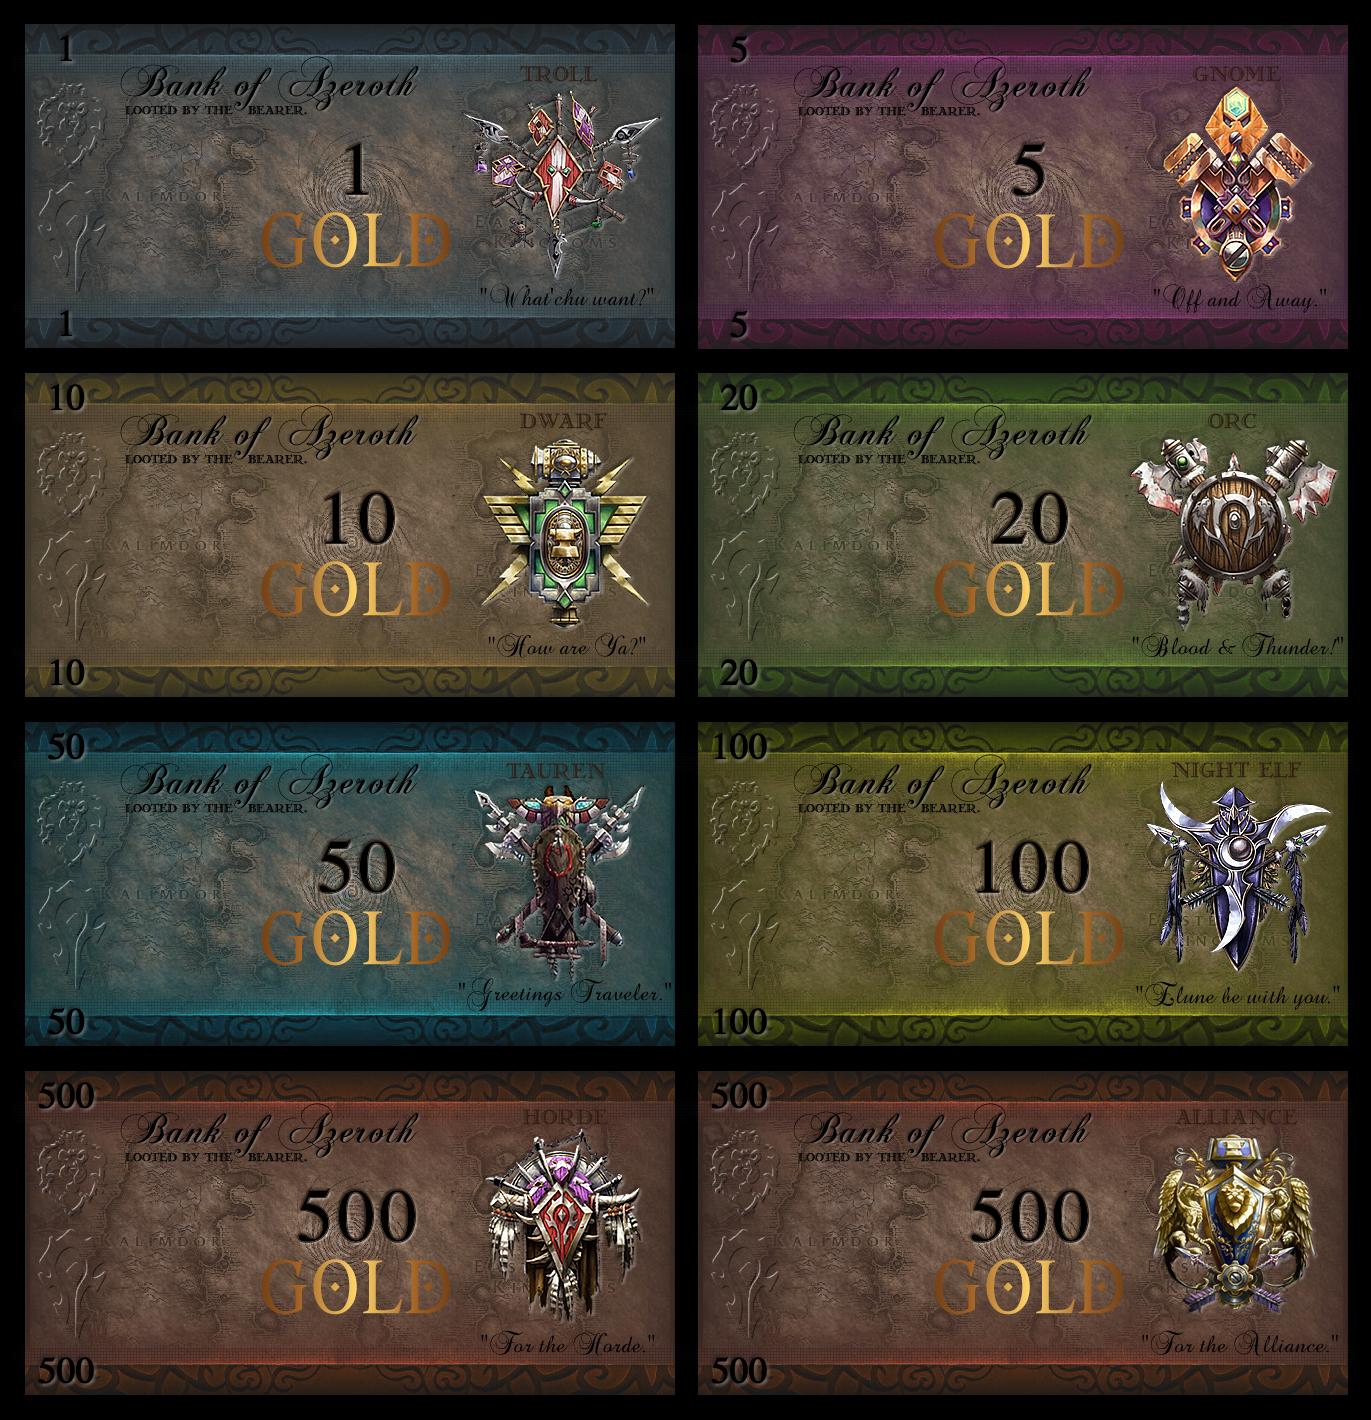 World of Warcraft Monopoly Money Set alternative version